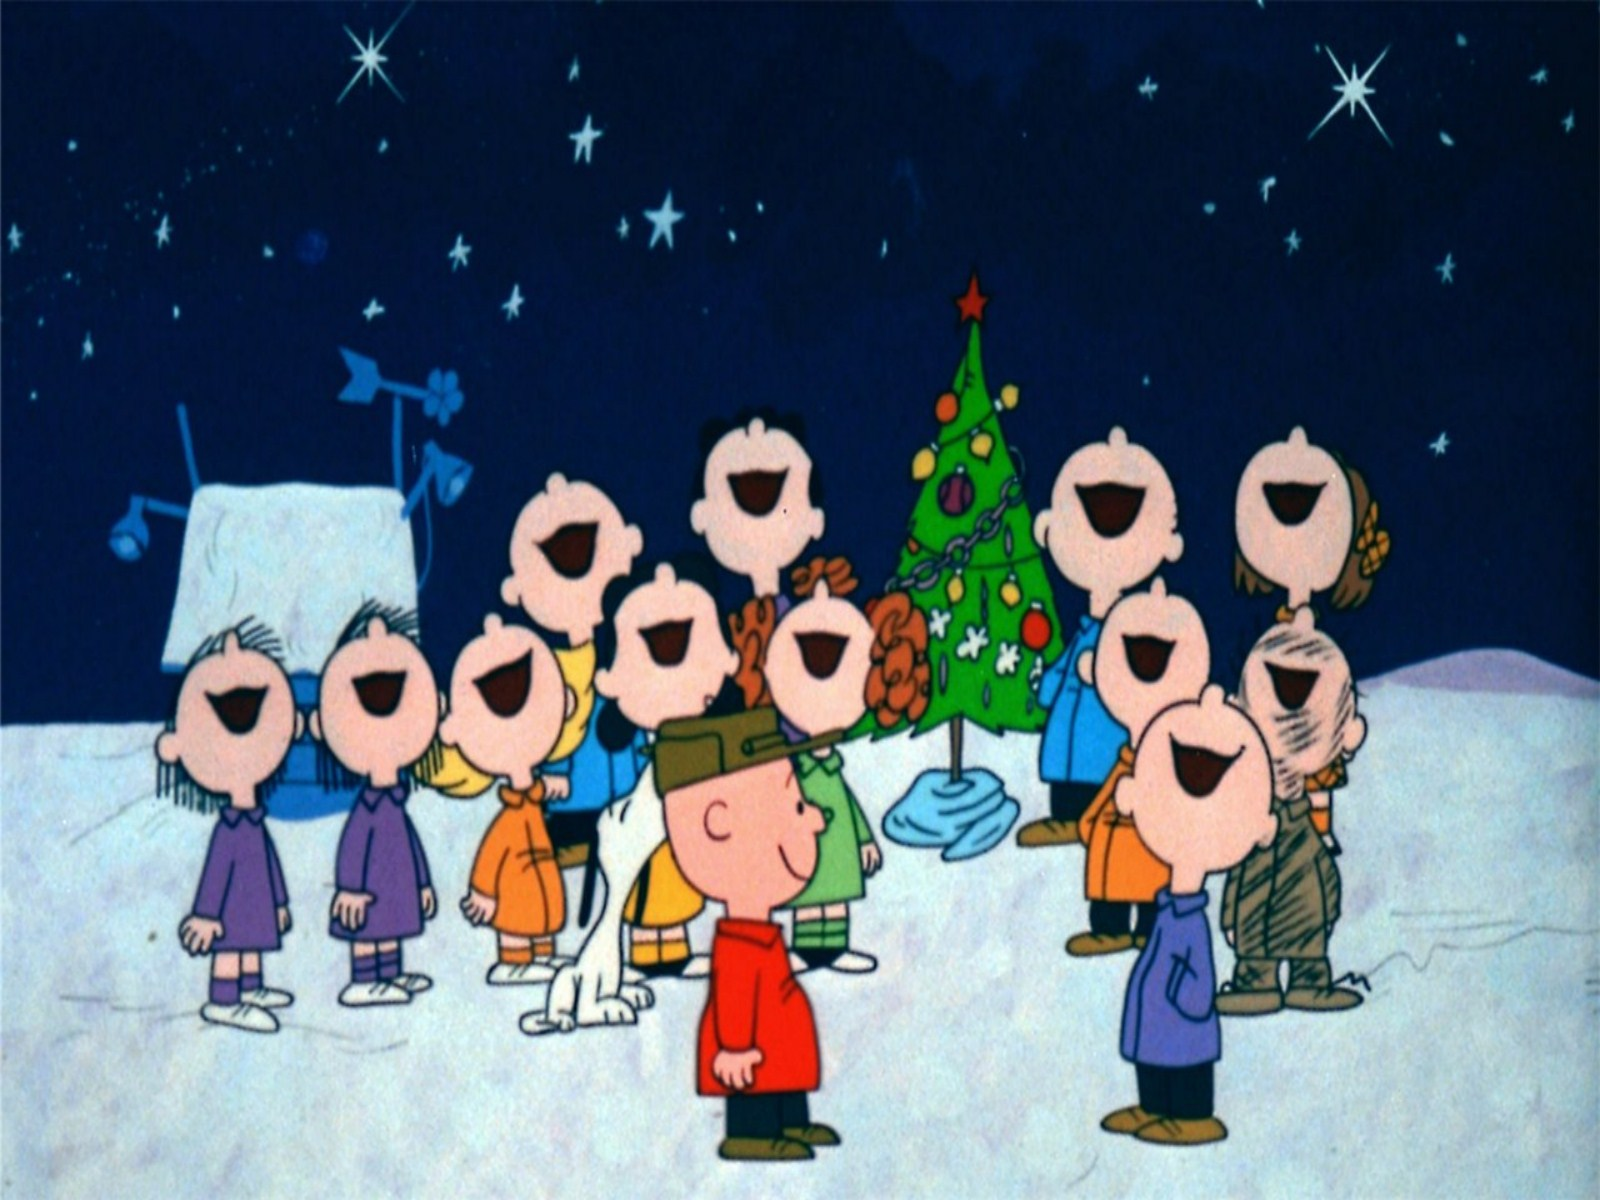 Charlie Brown Christmas Desktop Wallpaper   1600x1200   266266 1600x1200